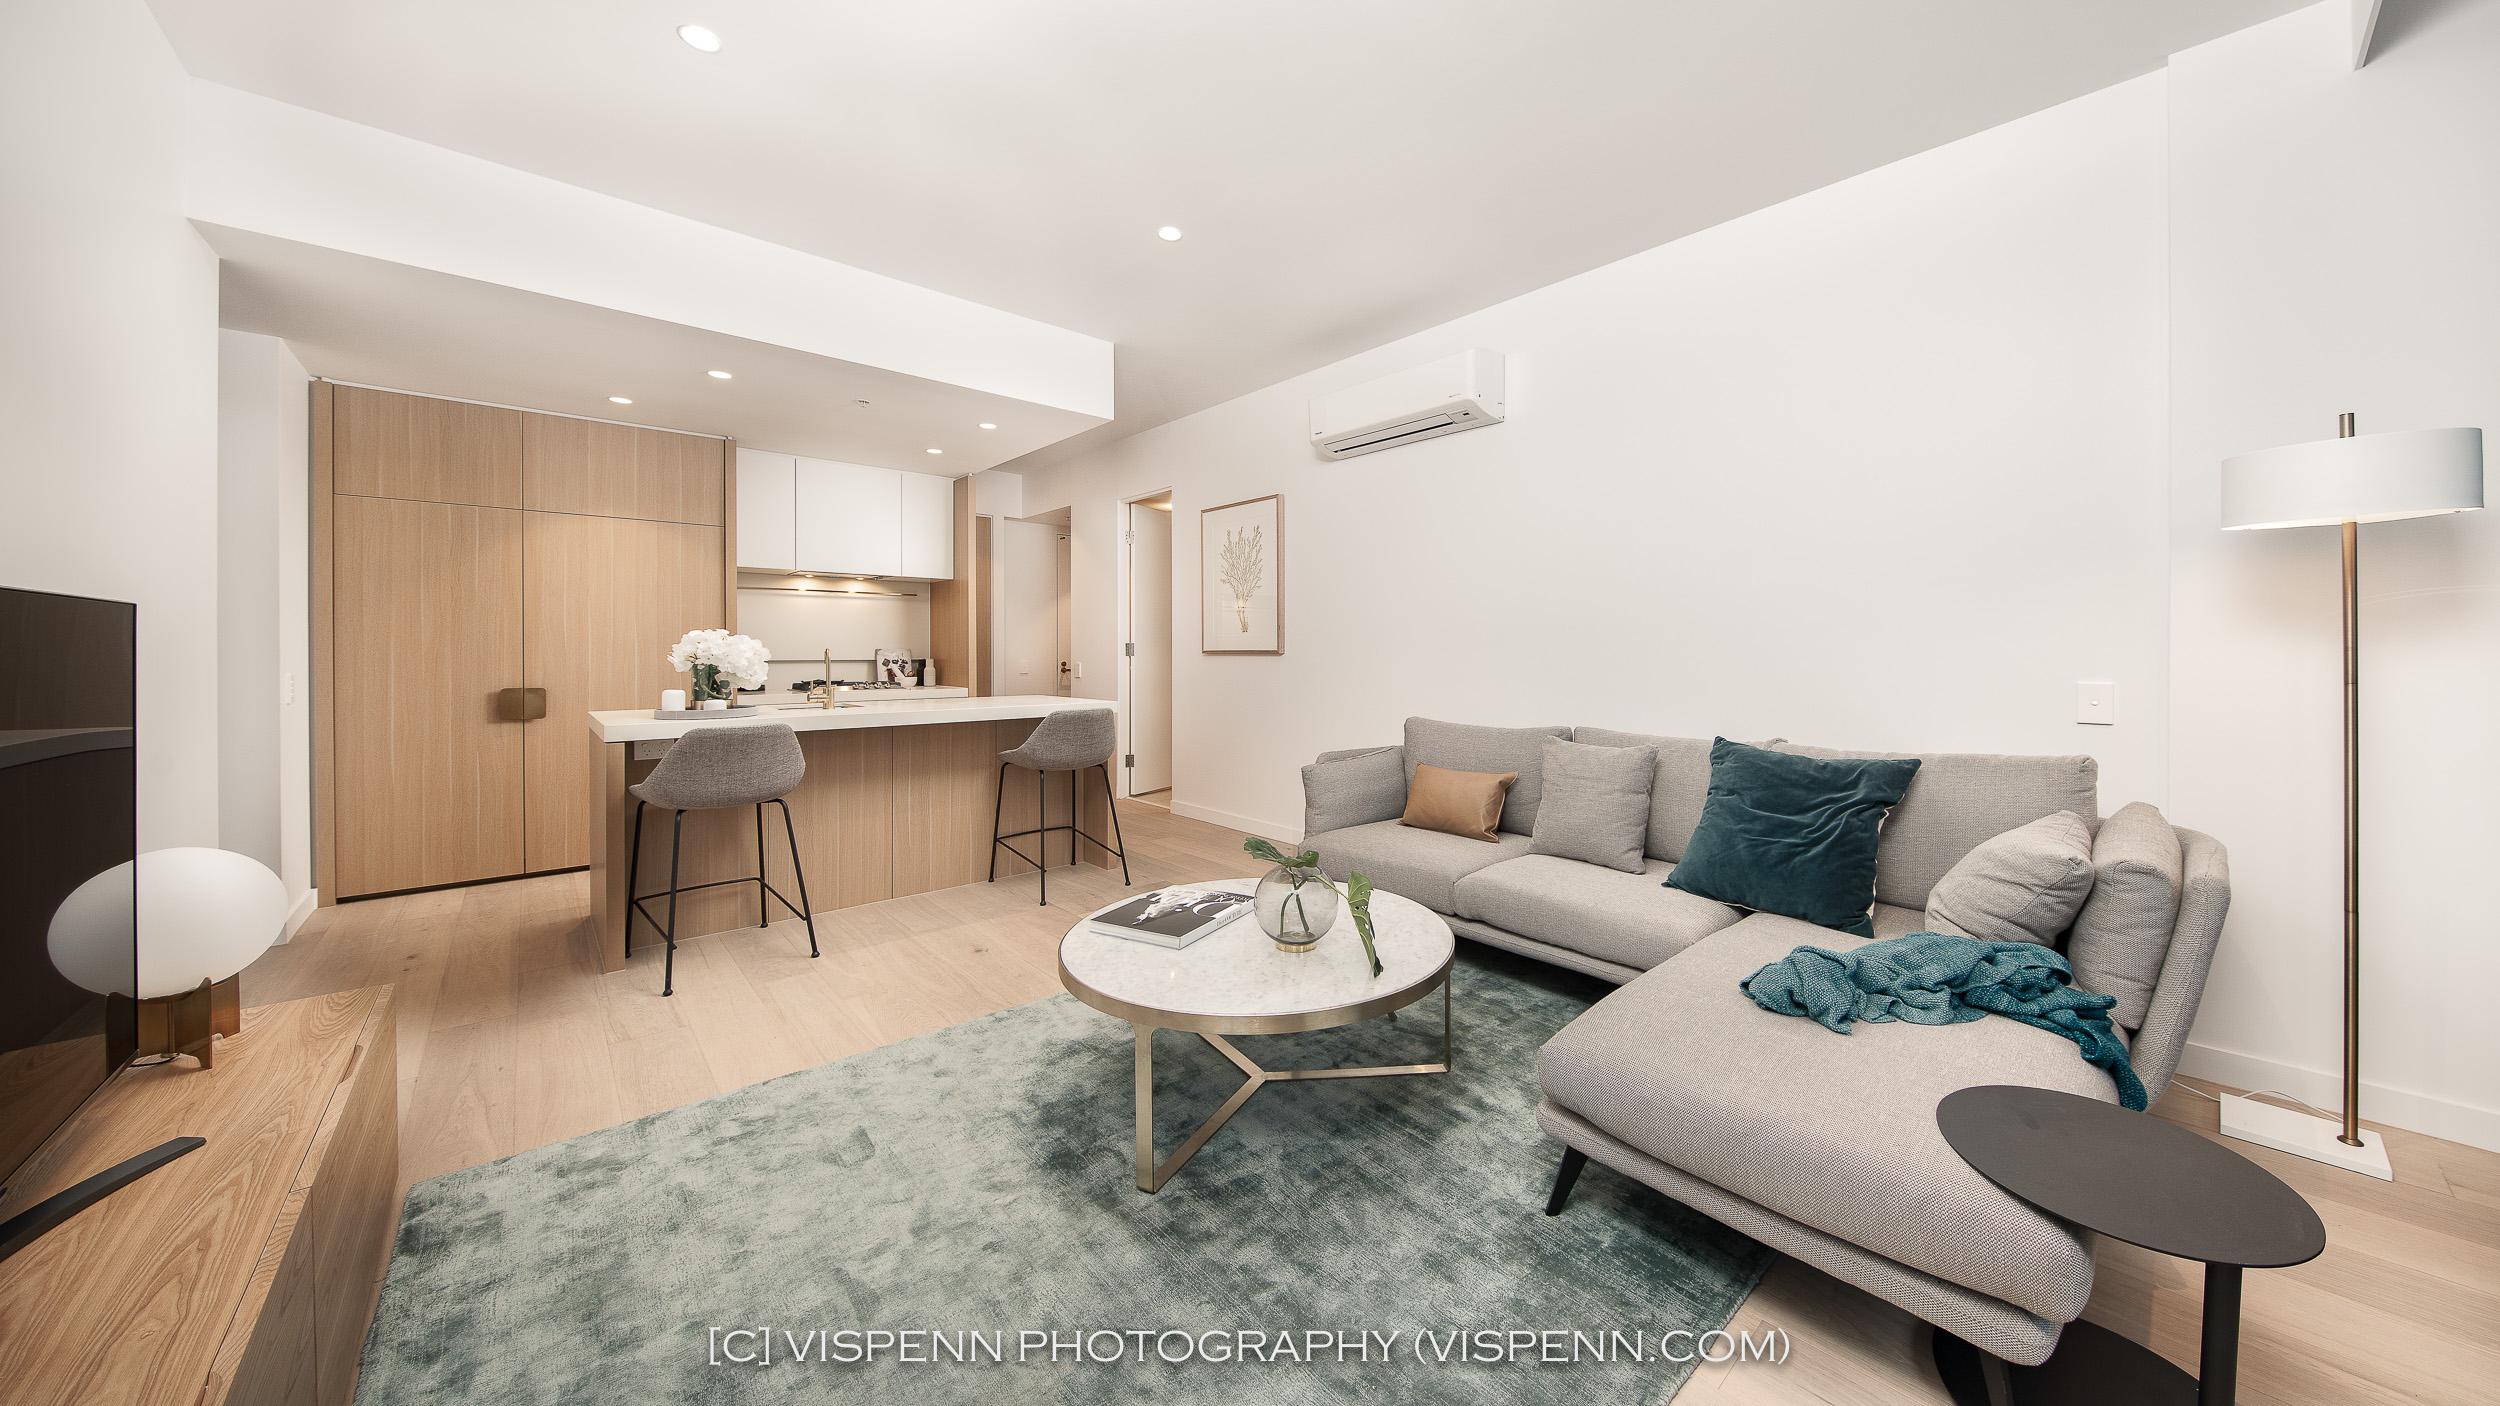 REAL ESTATE INTERIOR Photography Melbourne VISPENN 墨尔本 地产摄影 公寓拍摄 豪宅拍摄 VR远程看房 房产航拍 DSC09595 Edit